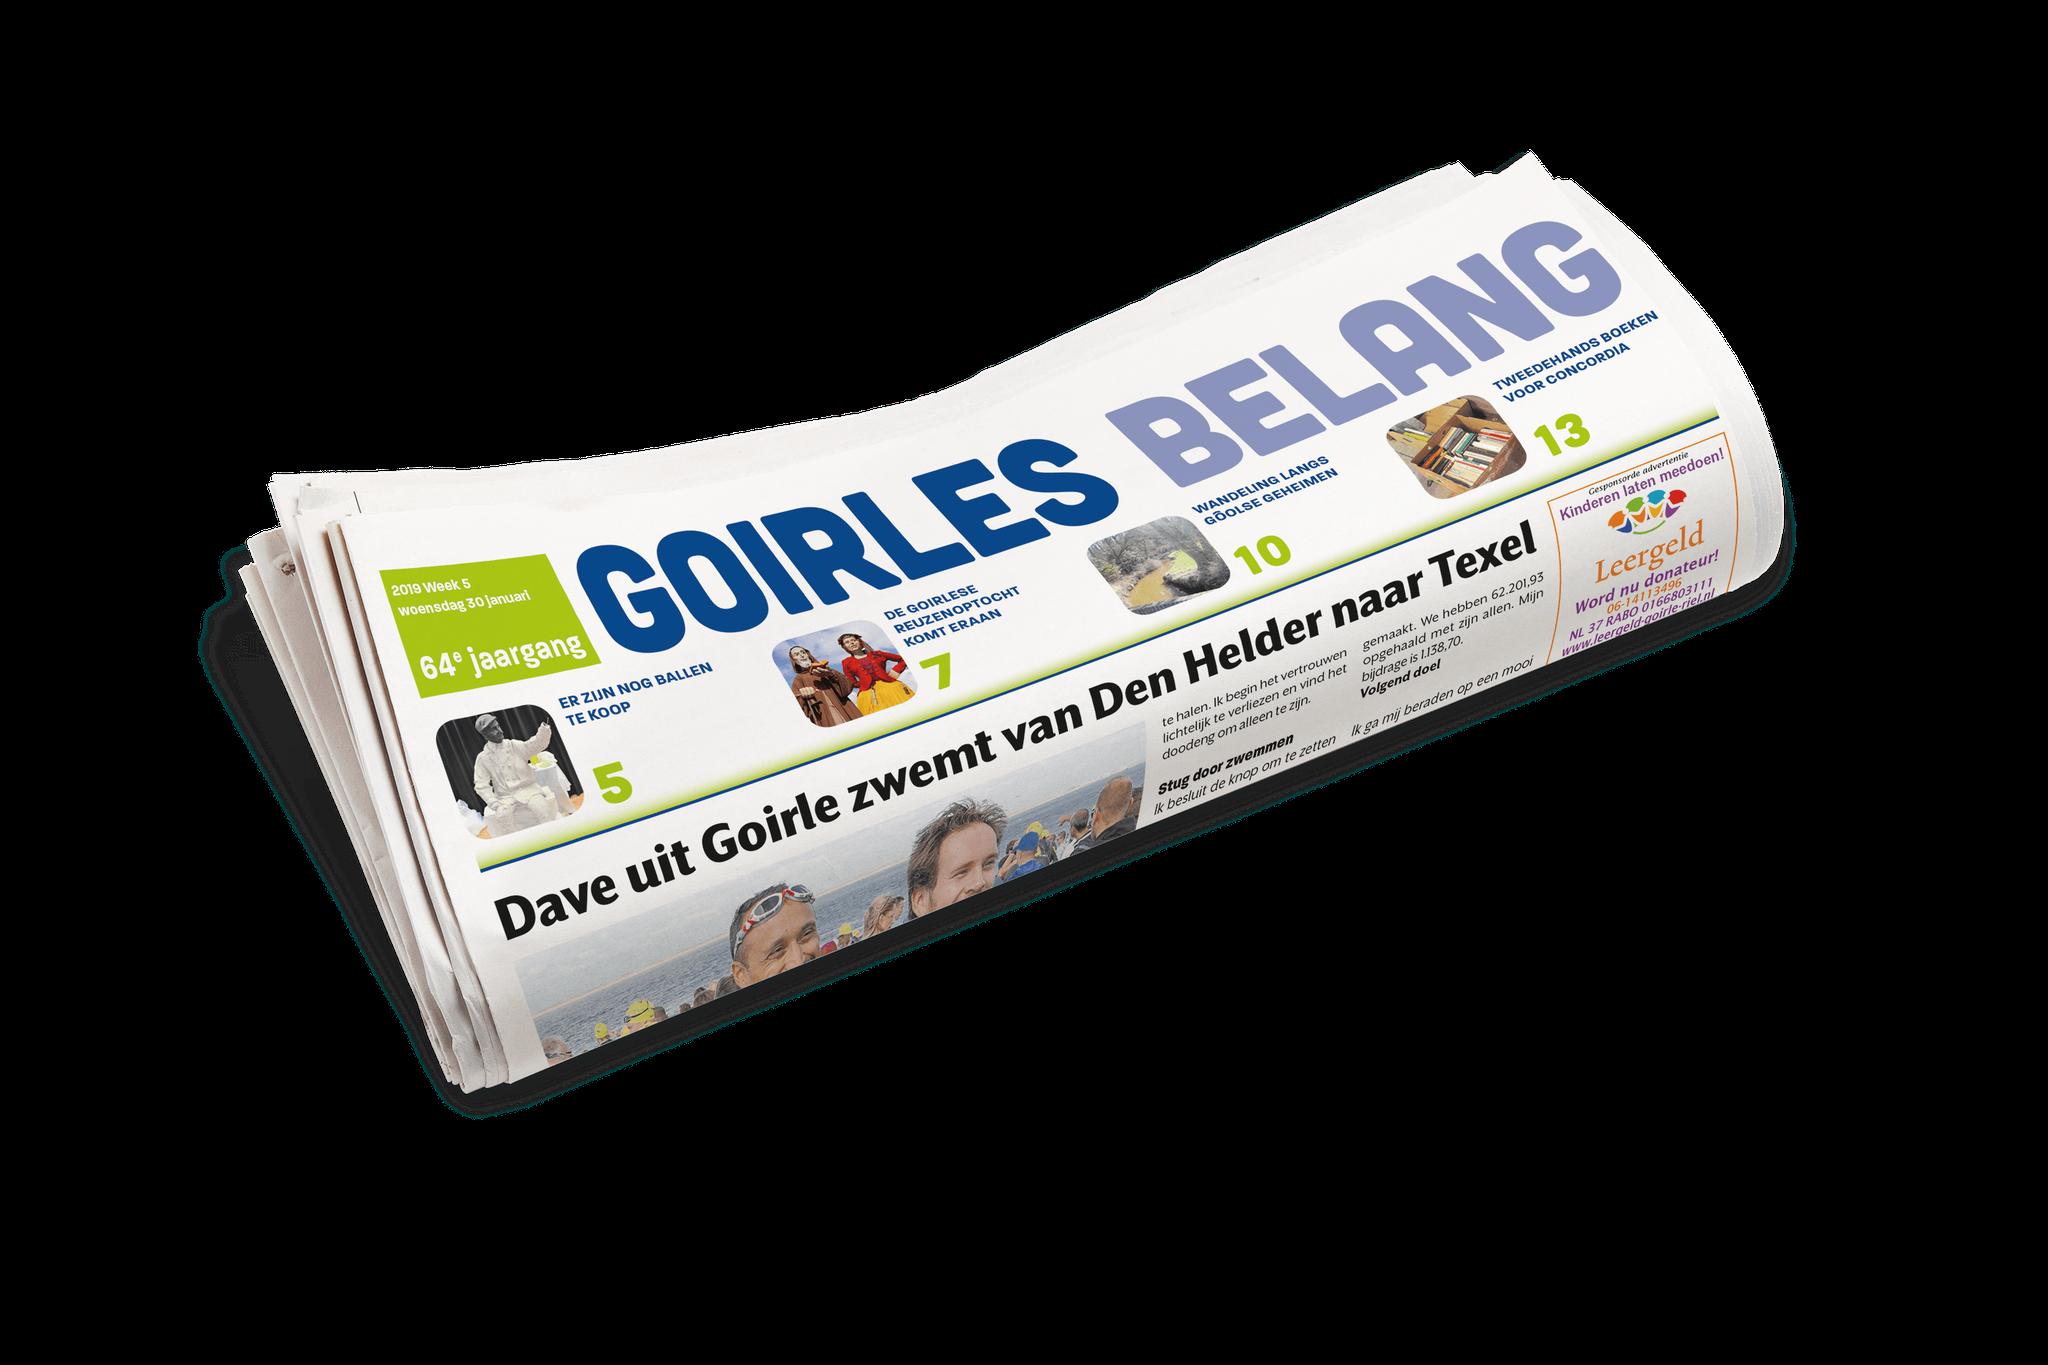 Goirles Belang